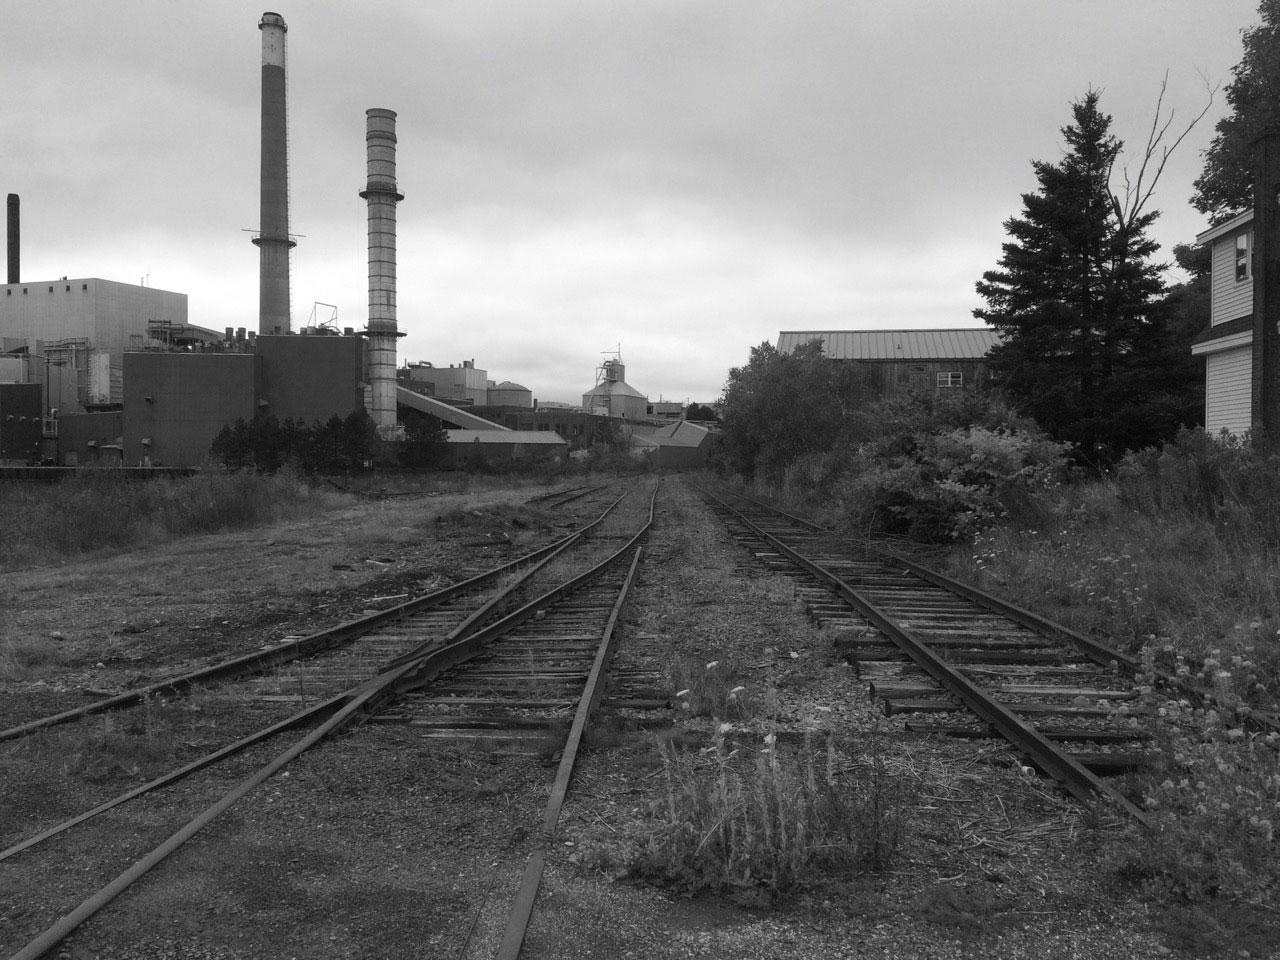 Trackside Elegy